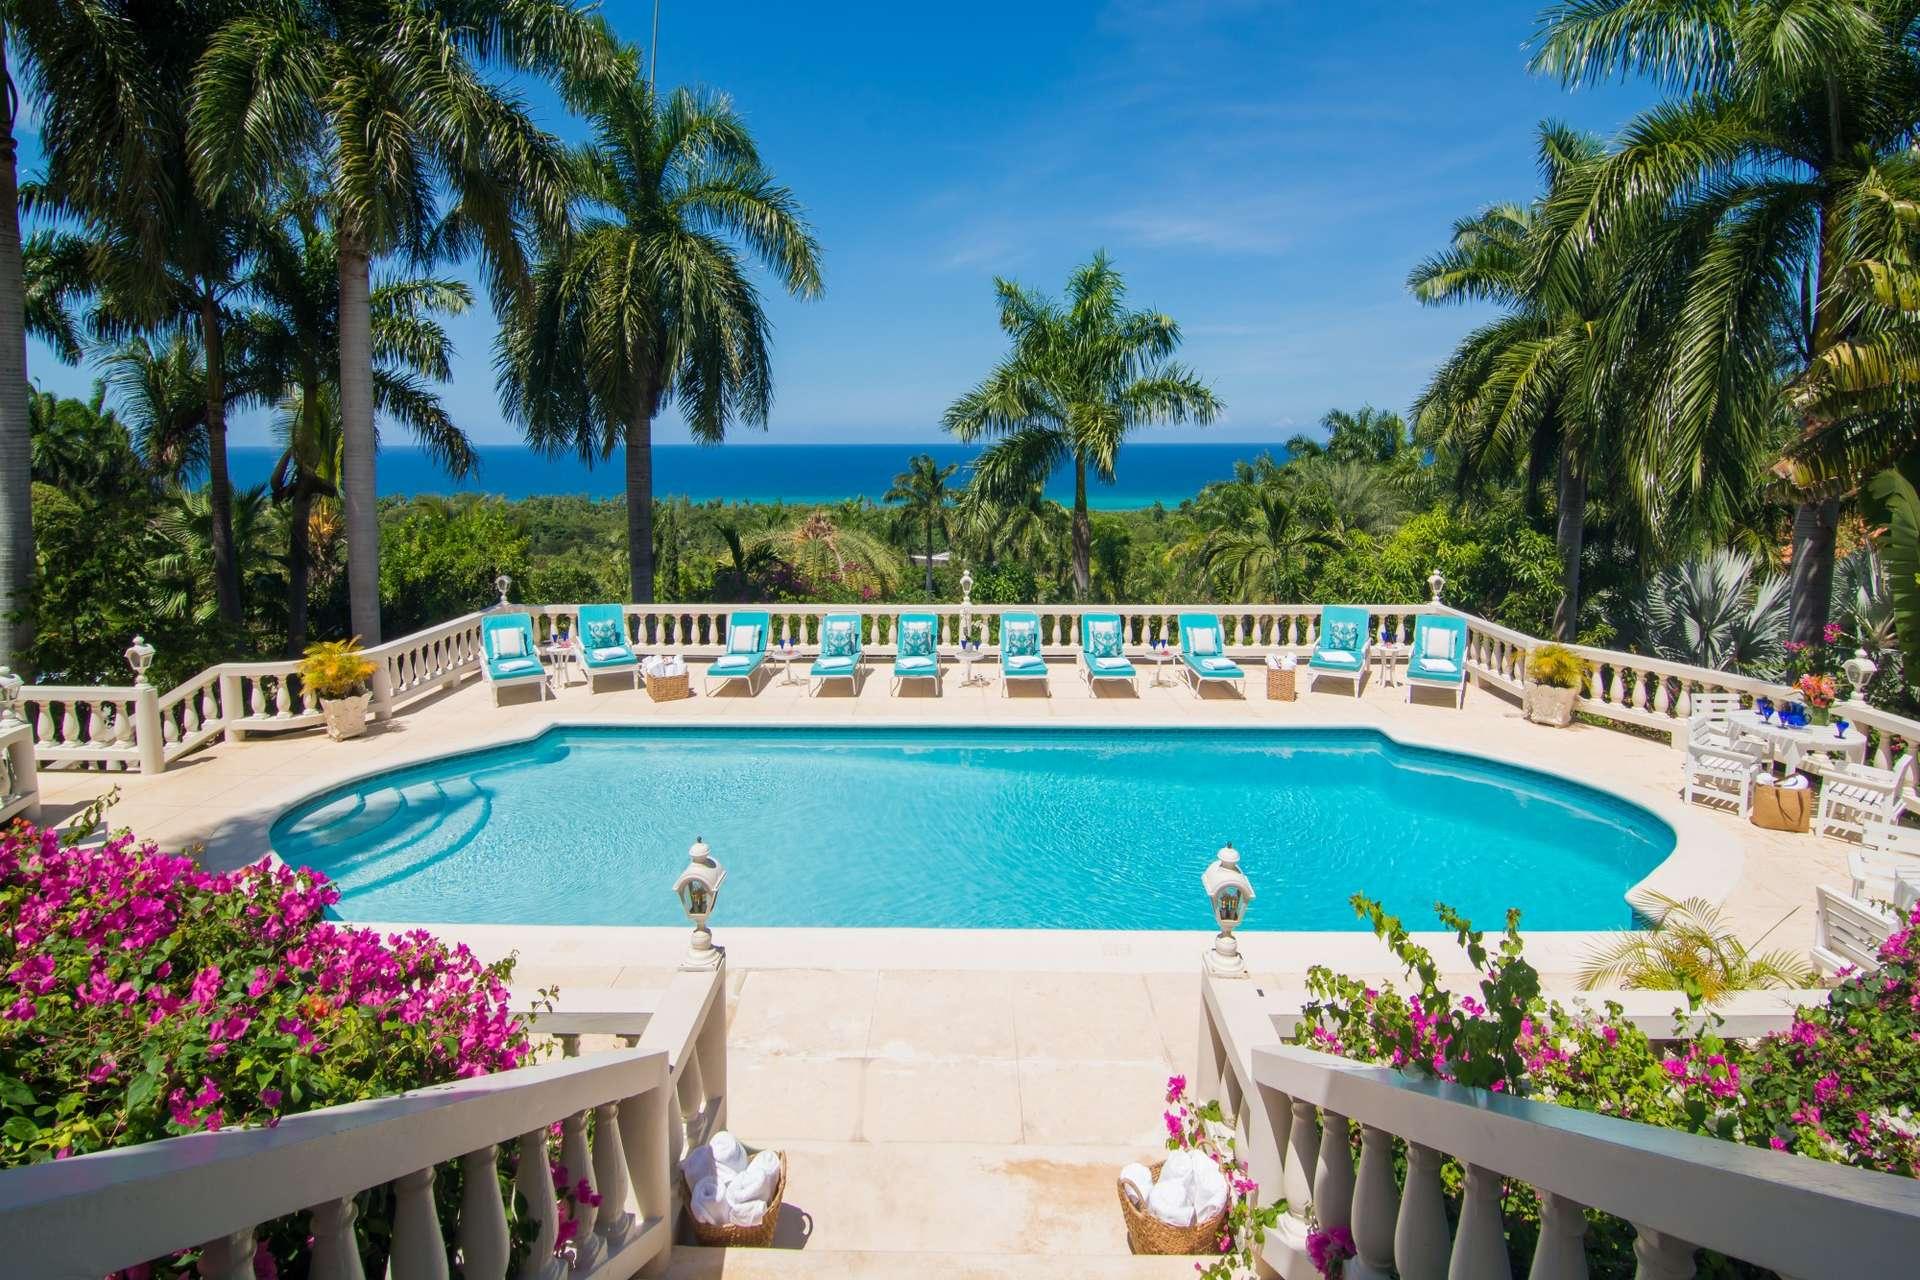 Luxury villa rentals caribbean - Jamaica - Montego bay - No location 4 - Endless Summer - Image 1/33